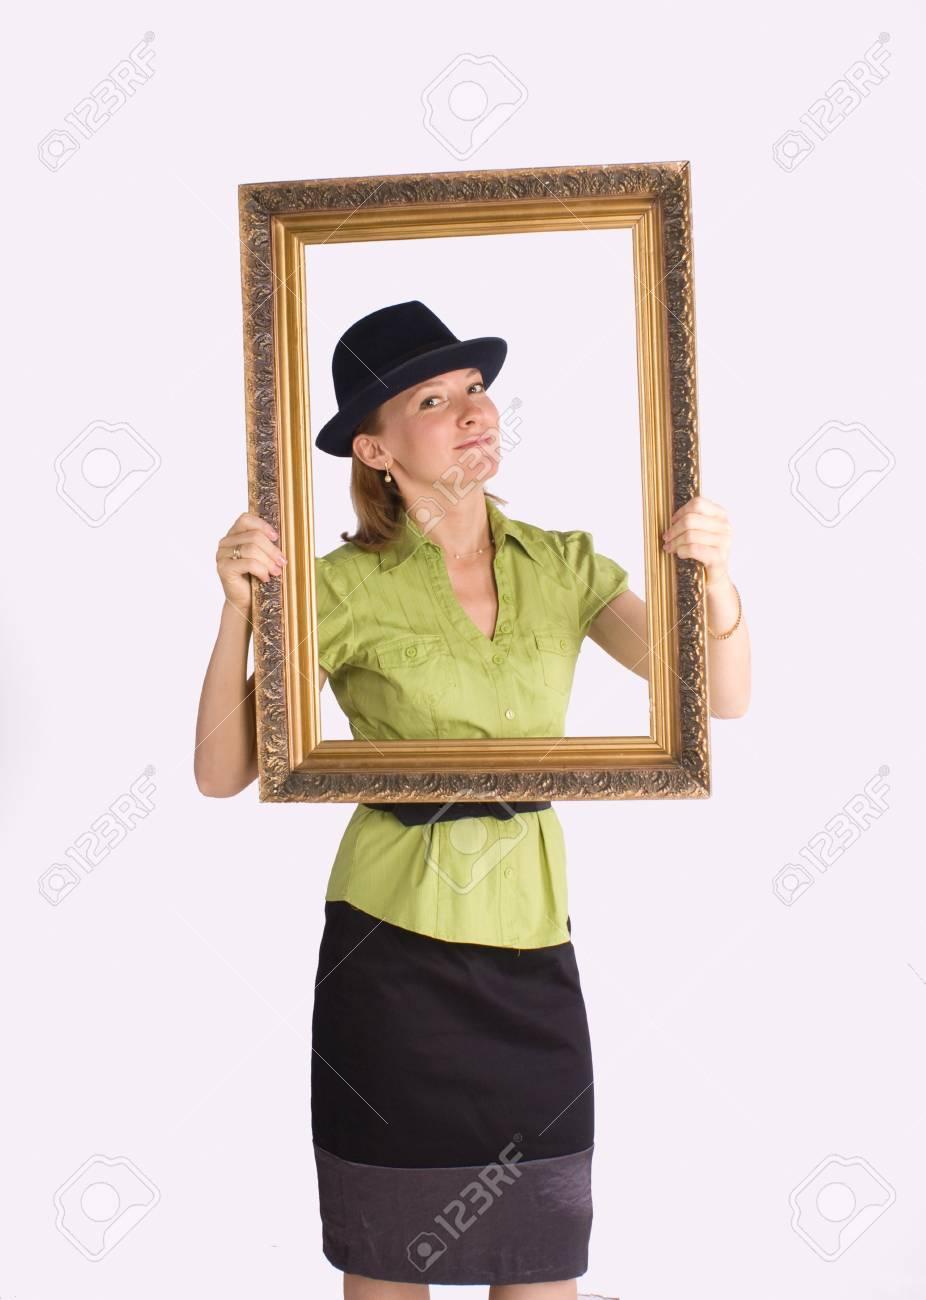 businesswoman in art frame smiling Stock Photo - 10019213